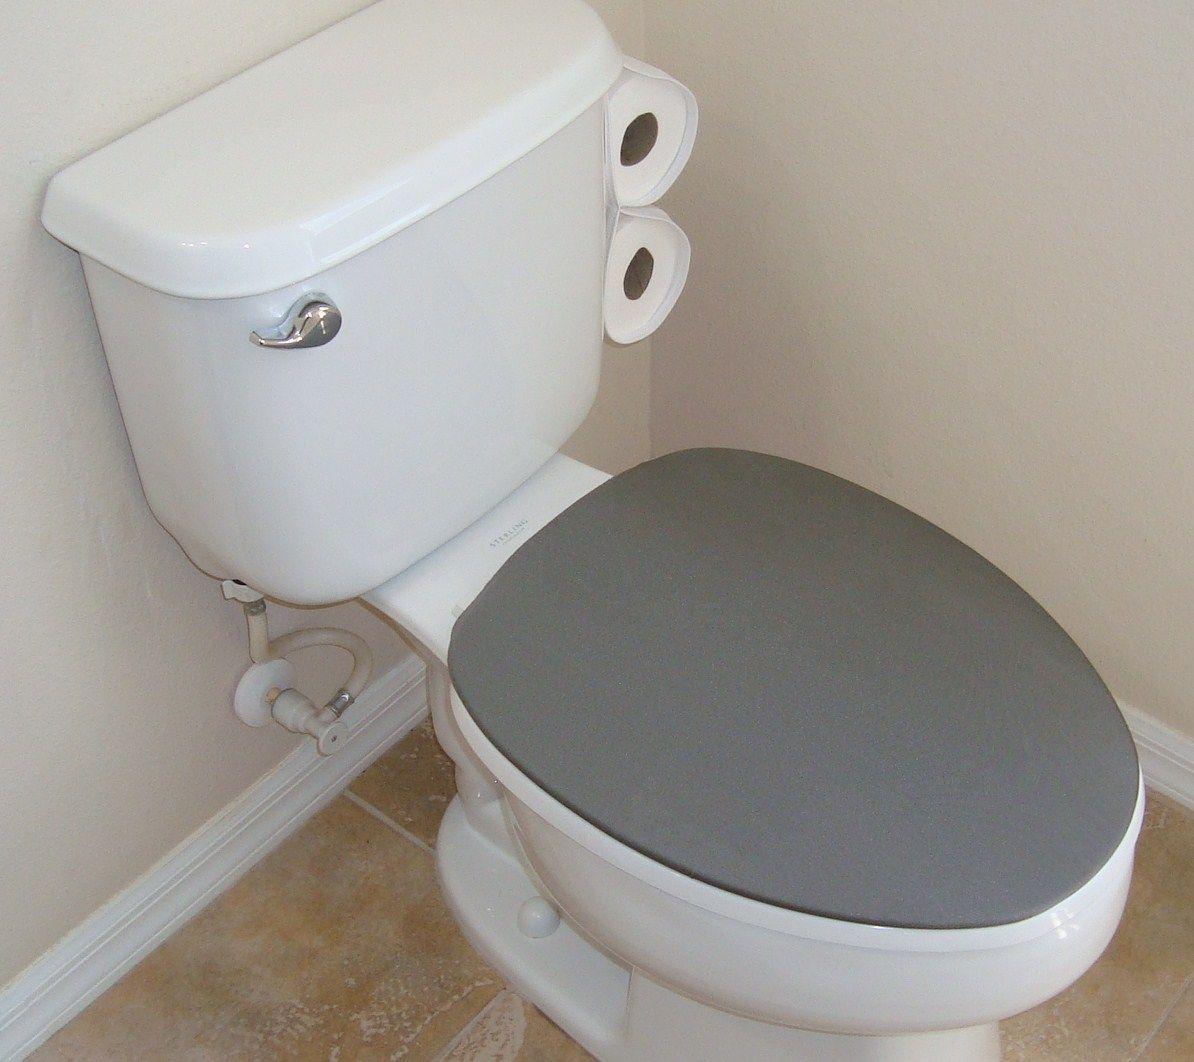 Toilet Litter Box Powder Room Toilets Bathrooms